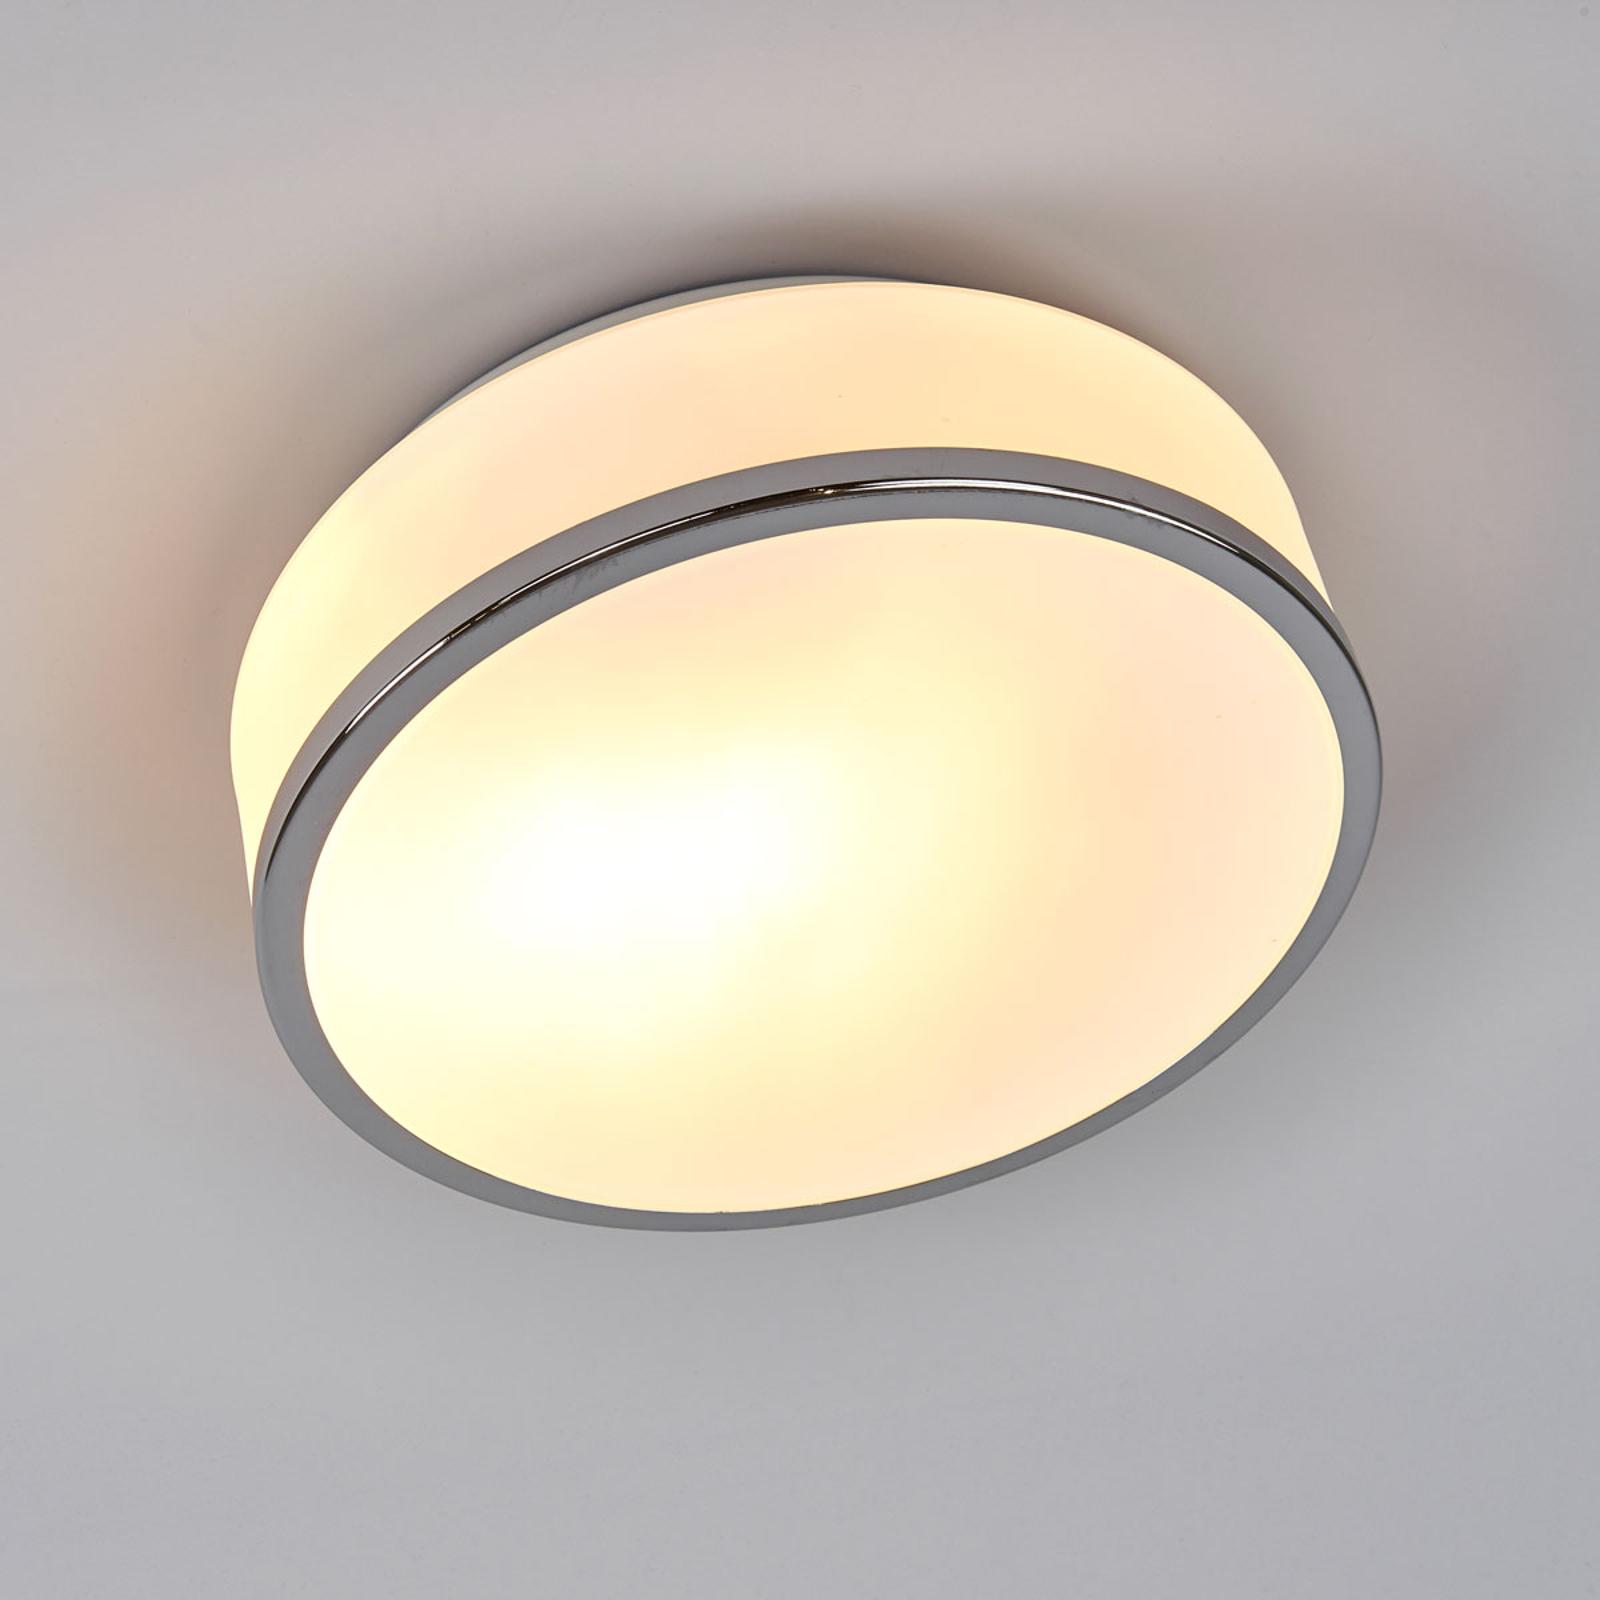 Plafoniera Flush IP44, Ø 23 cm, argento satinato